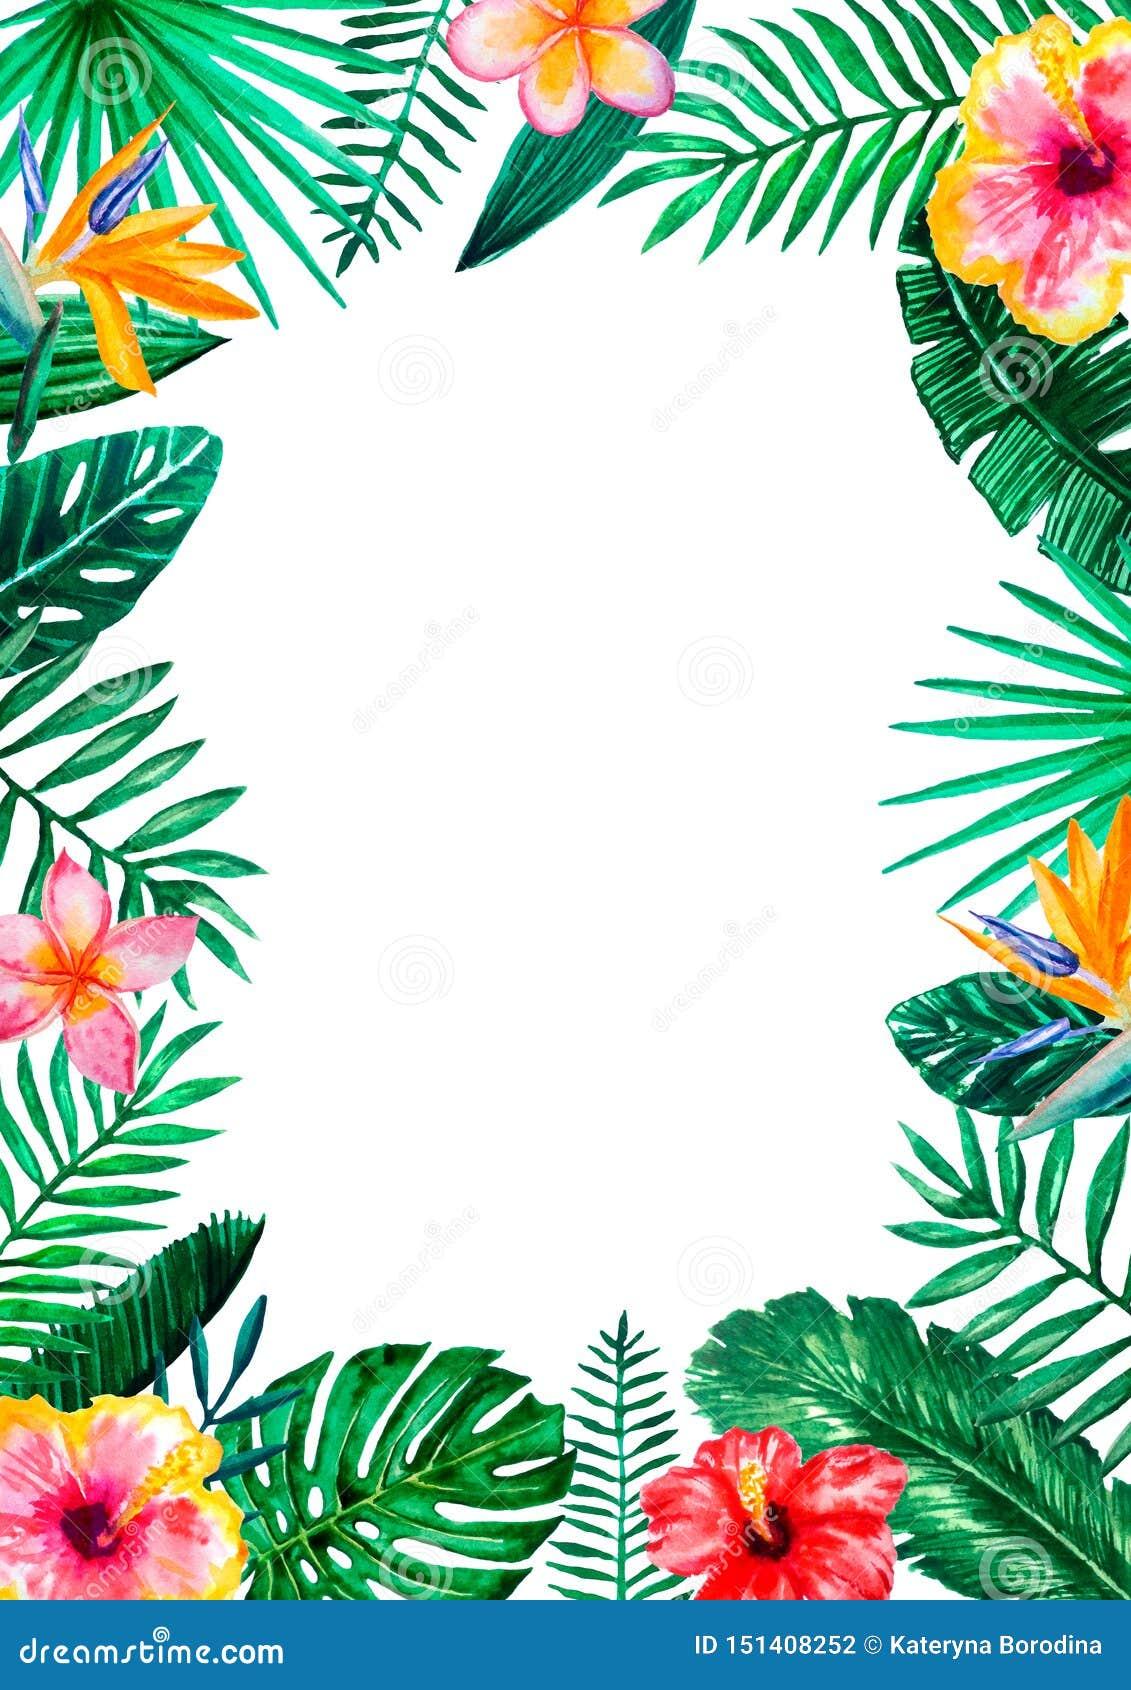 Boho Summer Wreath